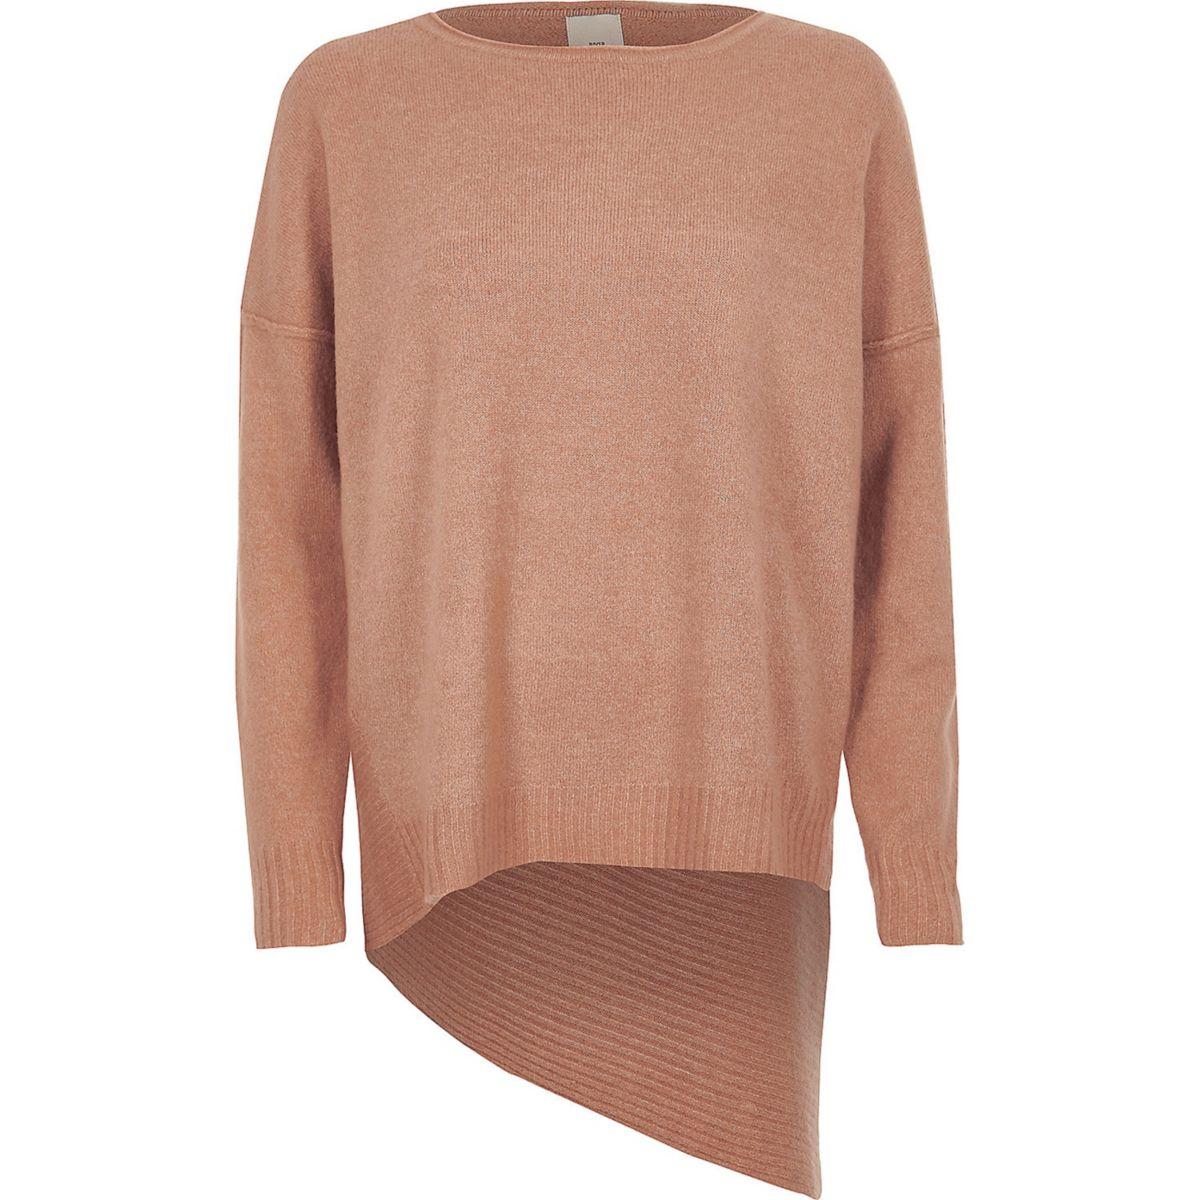 Pink asymmetric hem knit sweater